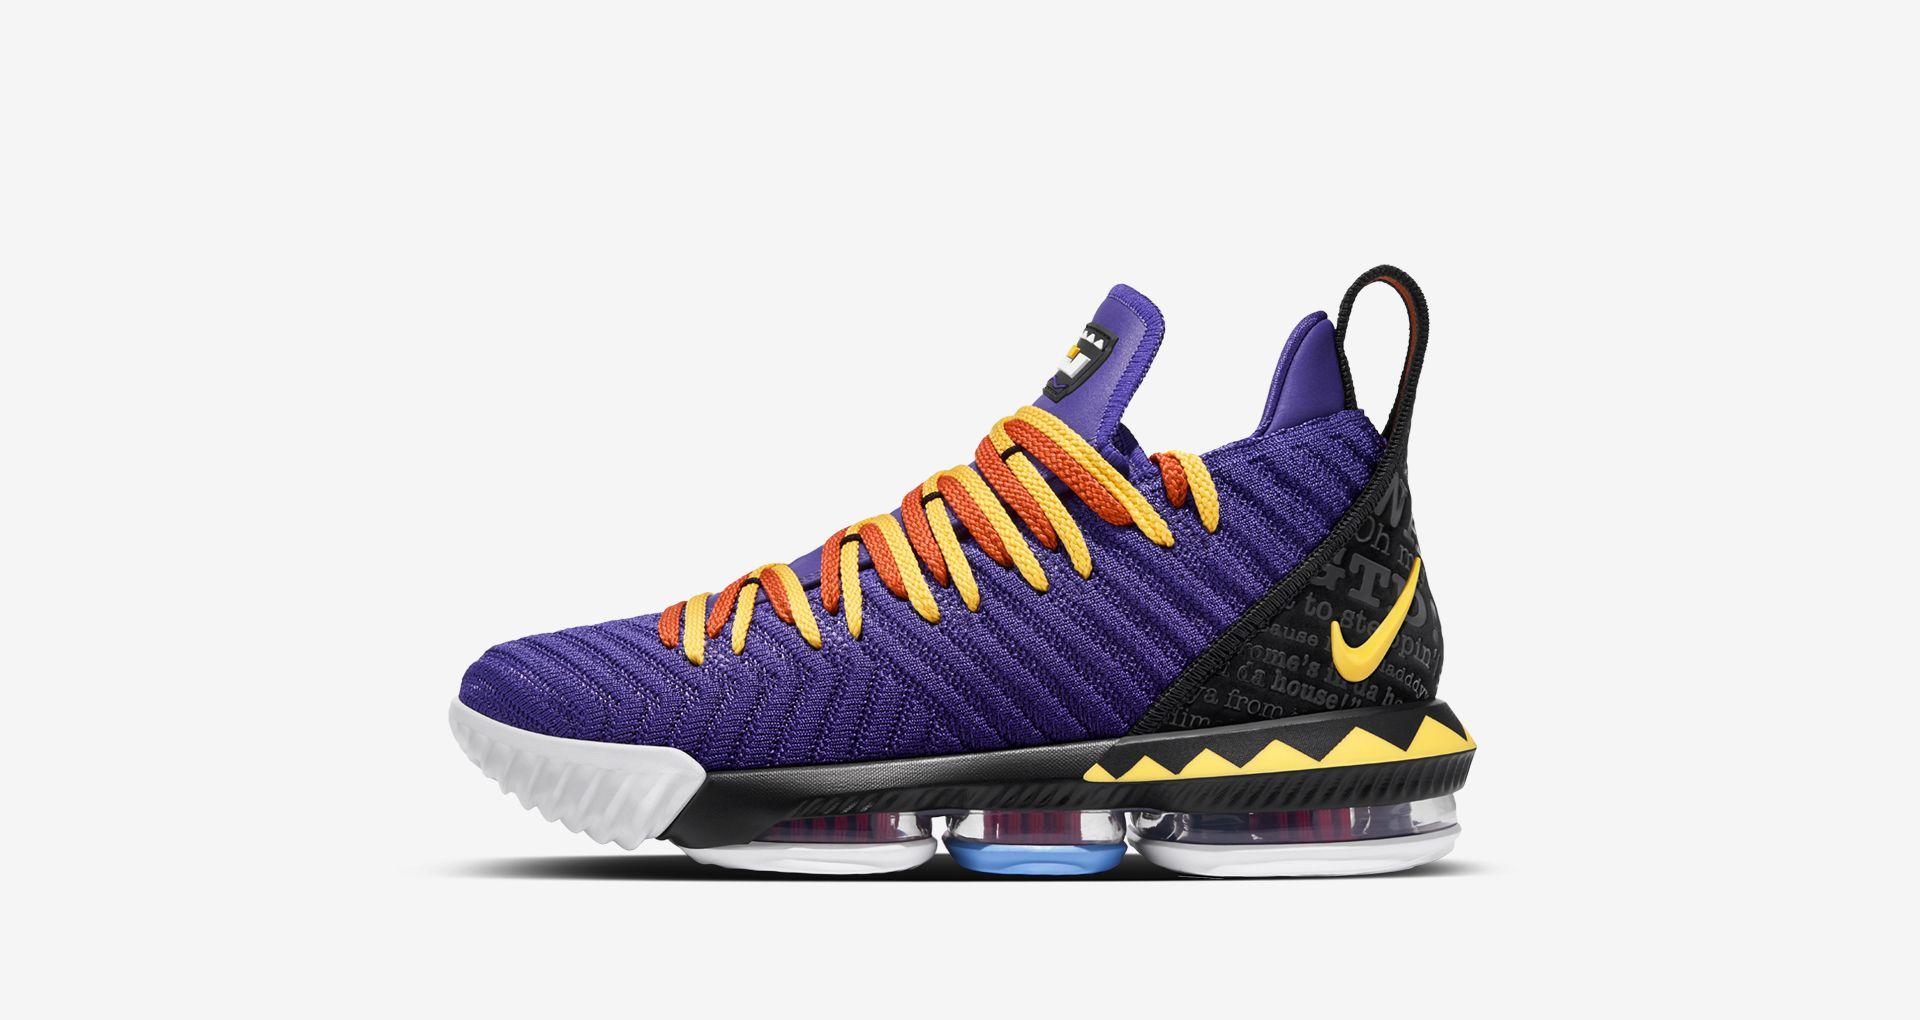 premium selection 07585 c0186 LeBron 16 'Martin' Release Date. Nike+ SNKRS